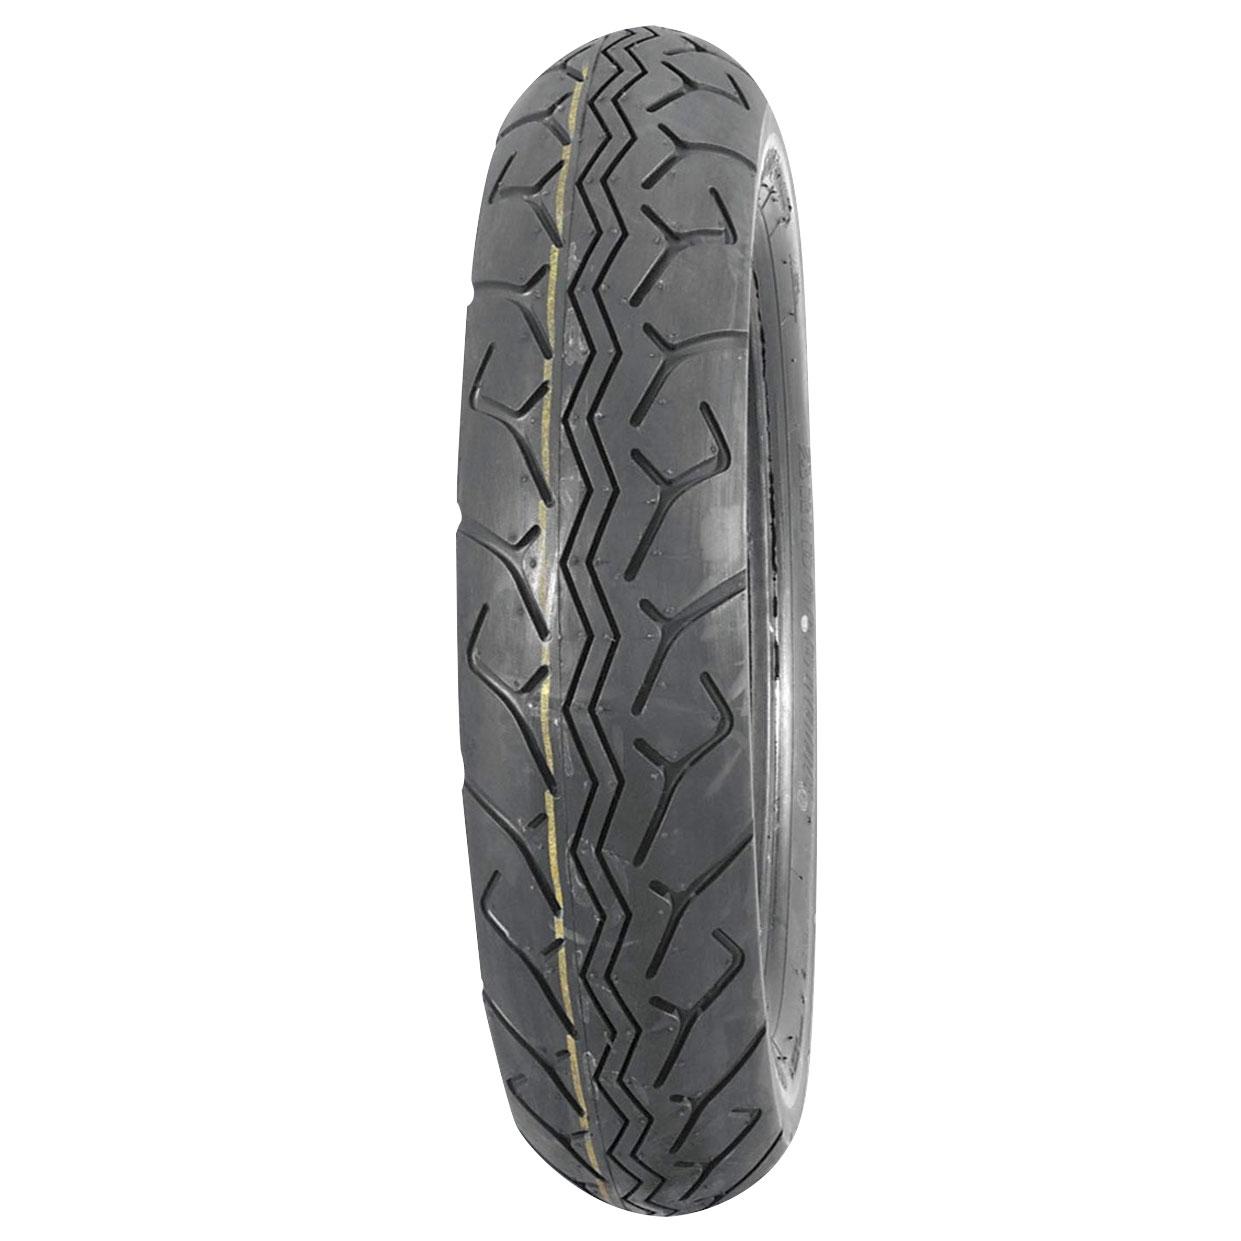 Bridgestone Exedra G703 130/90-16 Front Tire